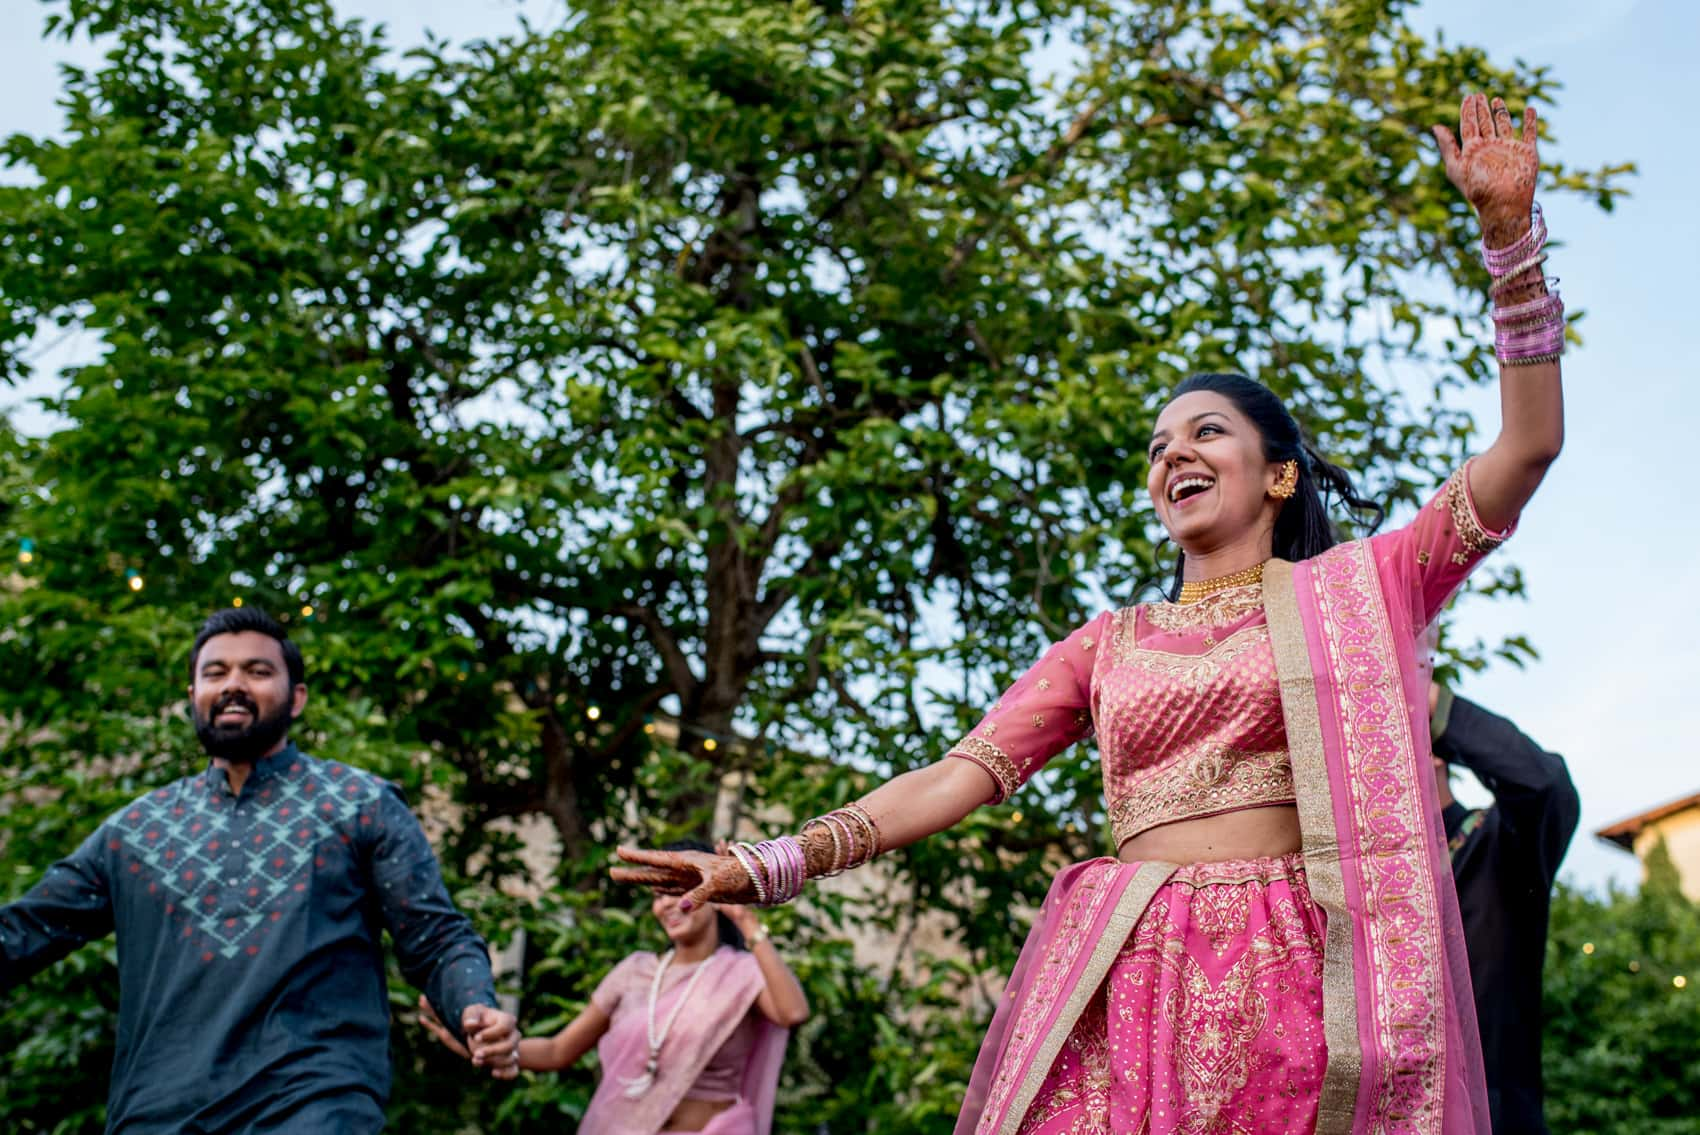 Indian dancing outside at the Giardino Corsini al Prato in Florence